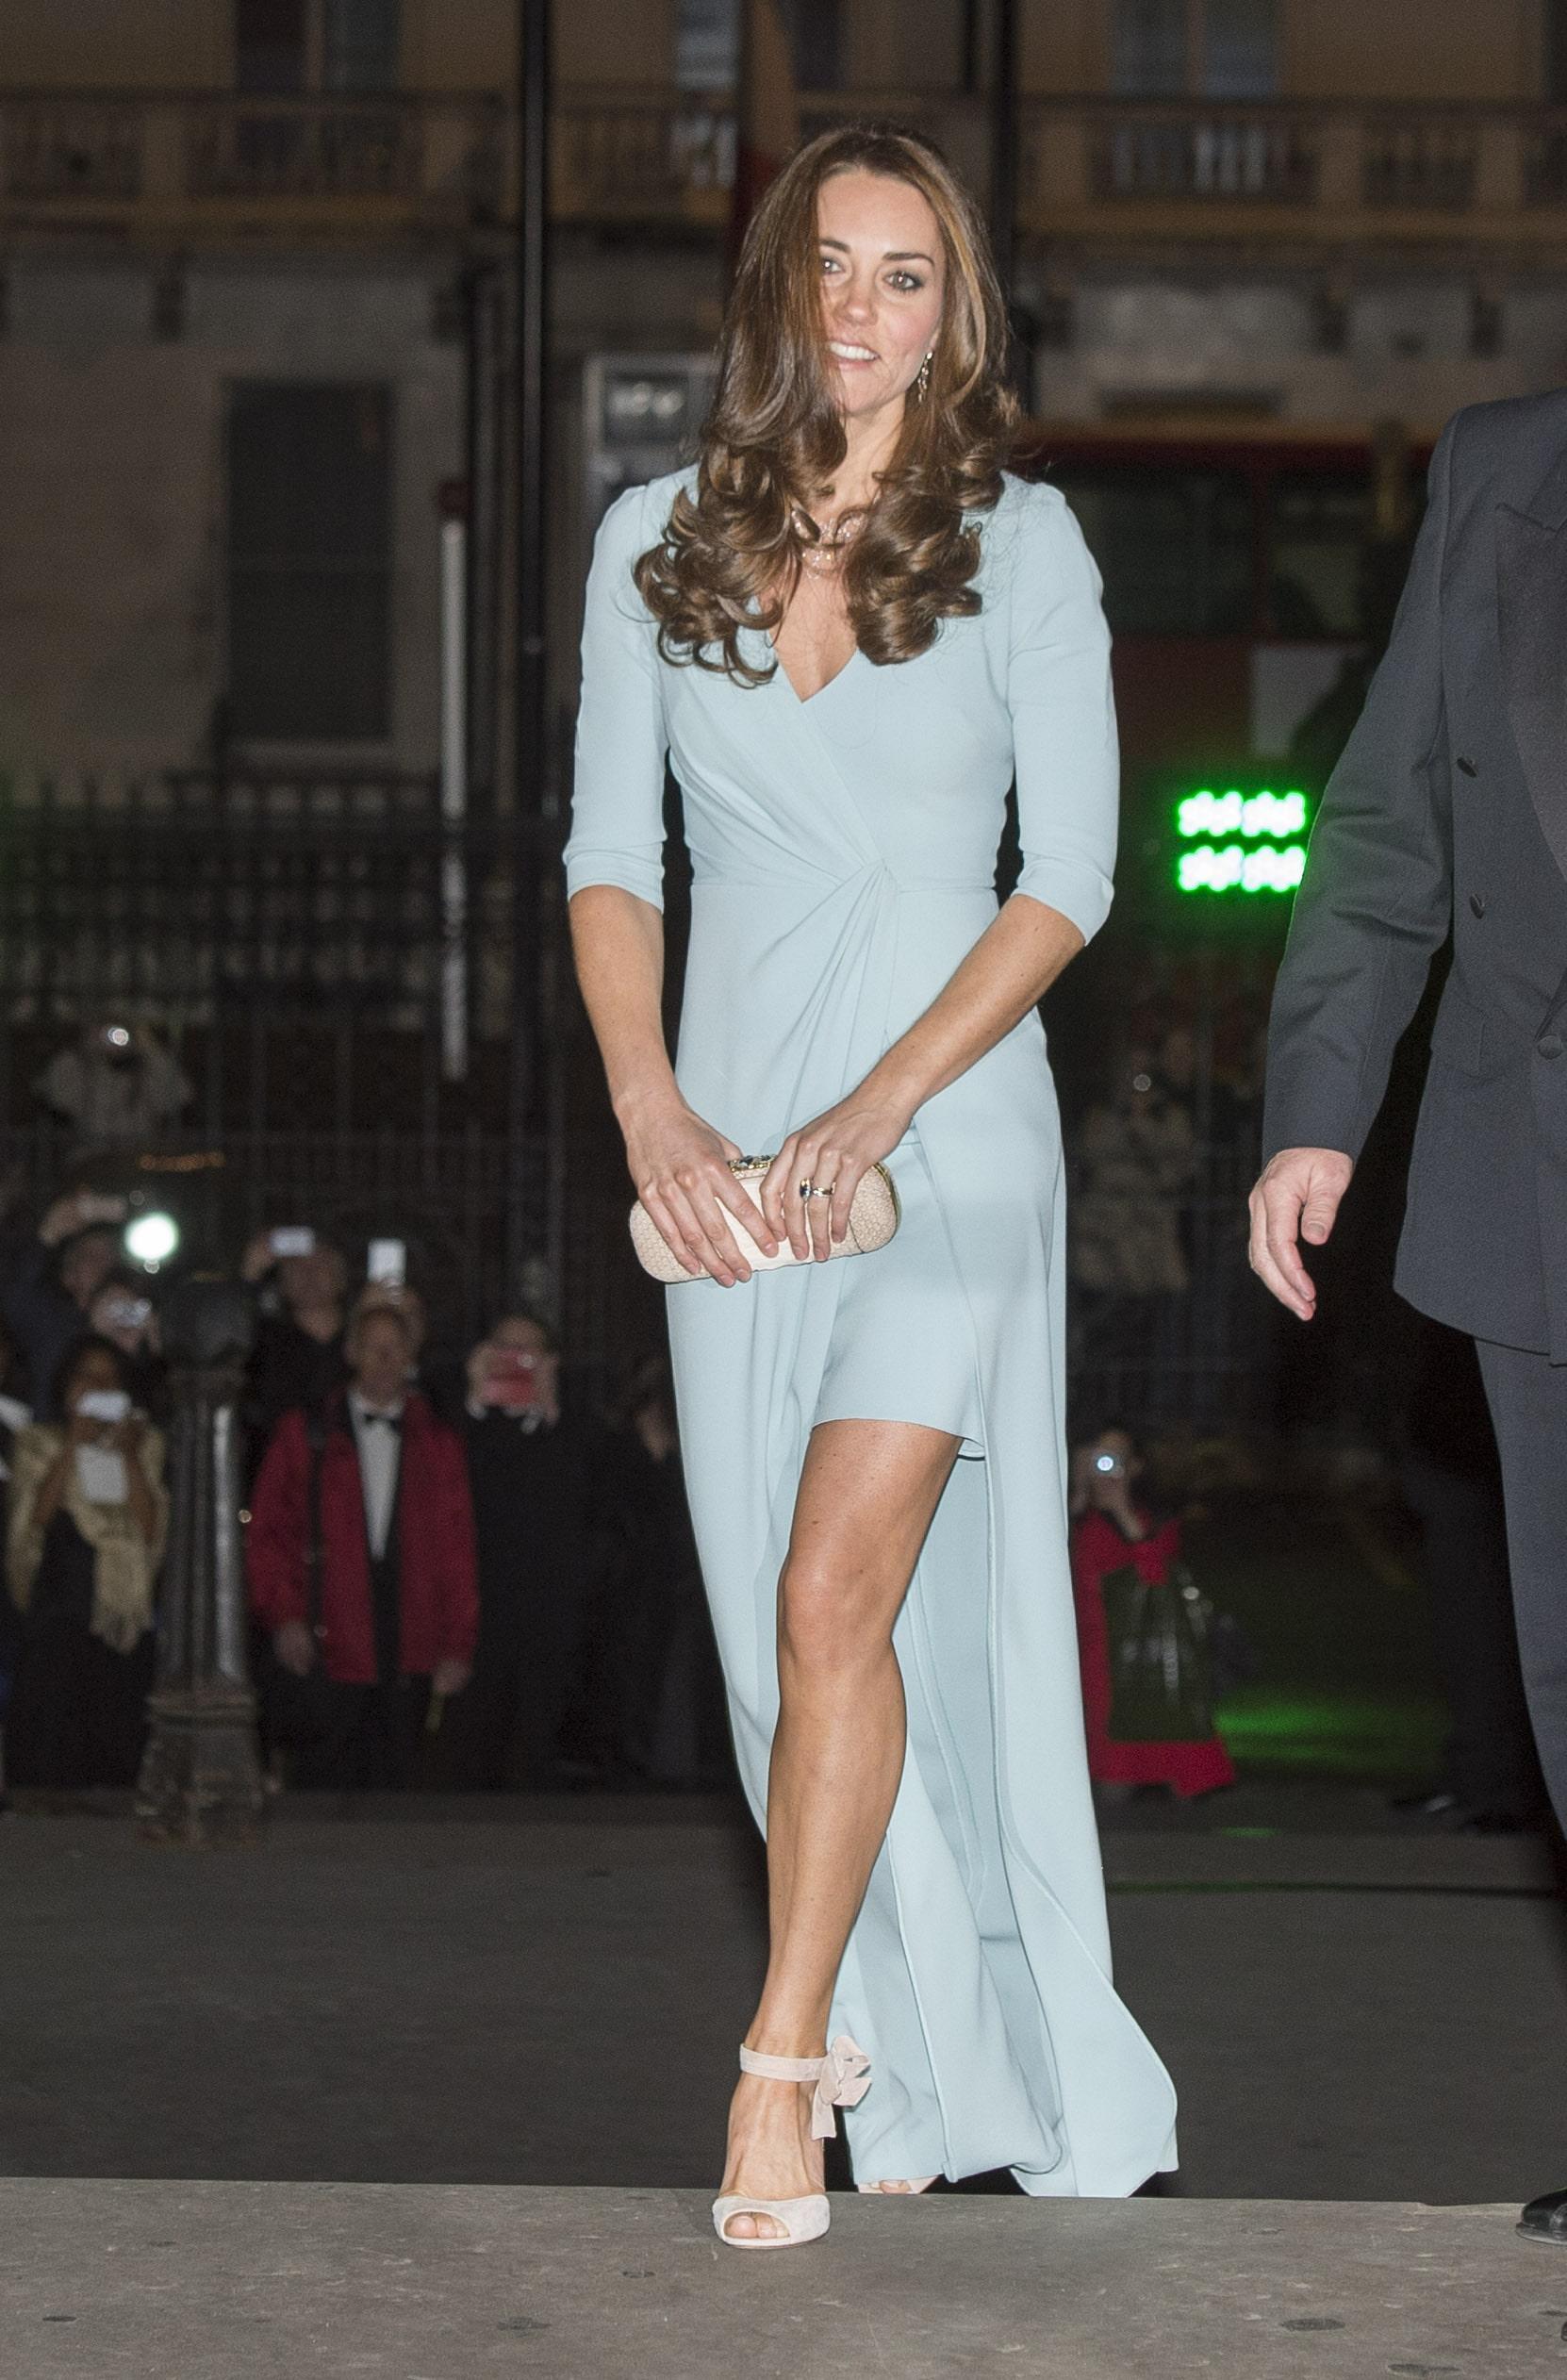 Catherine, Duchess of Cambridge sexy cleavage pics